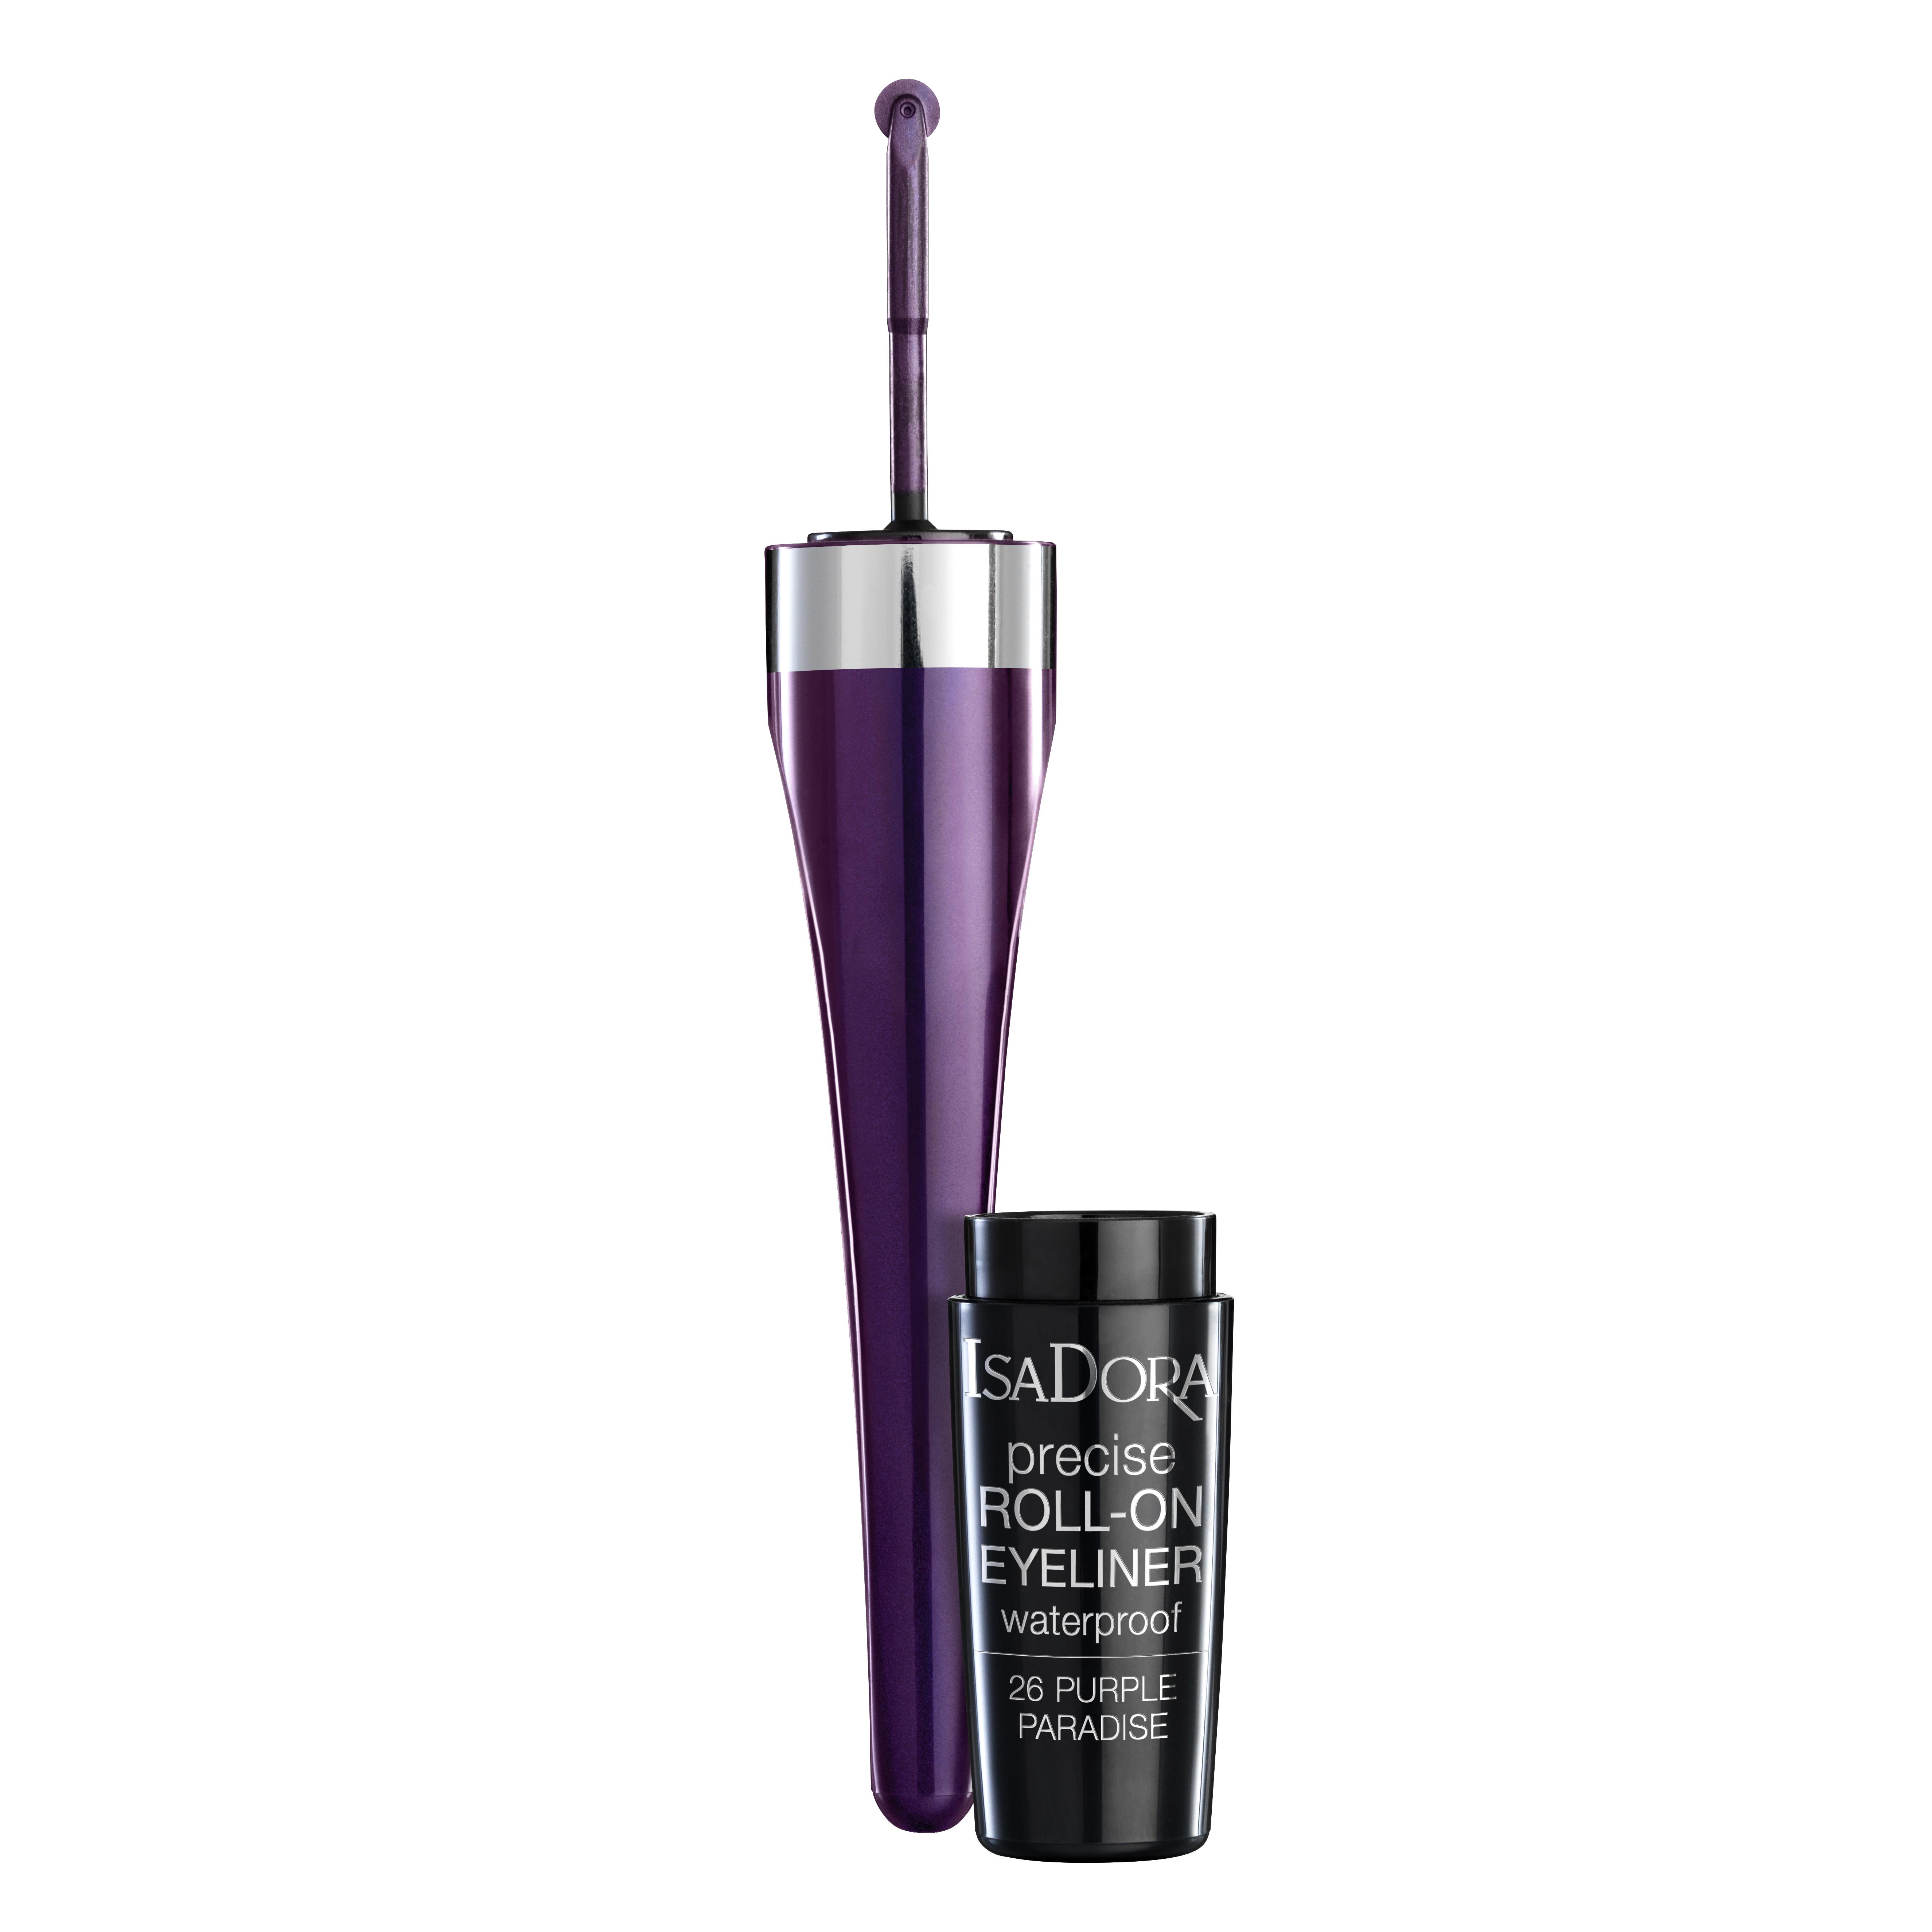 Precise Roll-on Eyeliner 26 Purple Paradise